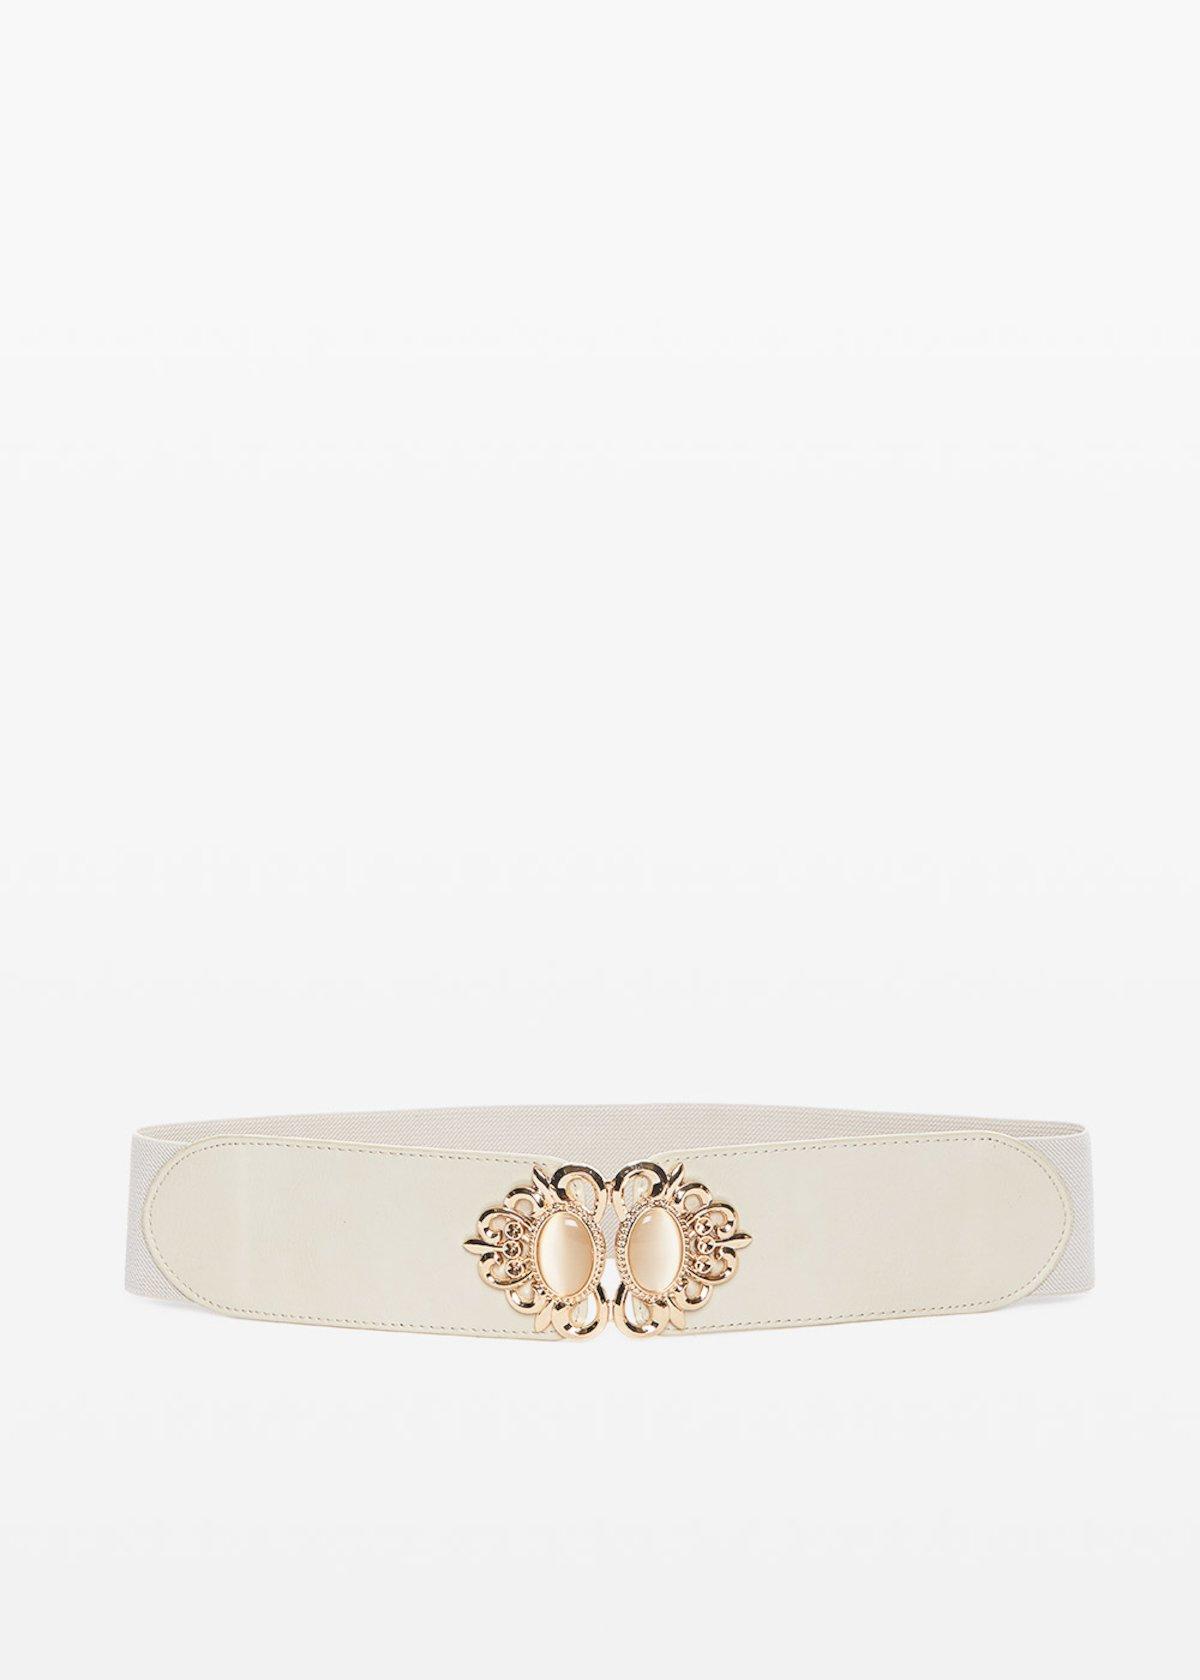 Charlott faux leather belt with light gold closure - Light Beige - Woman